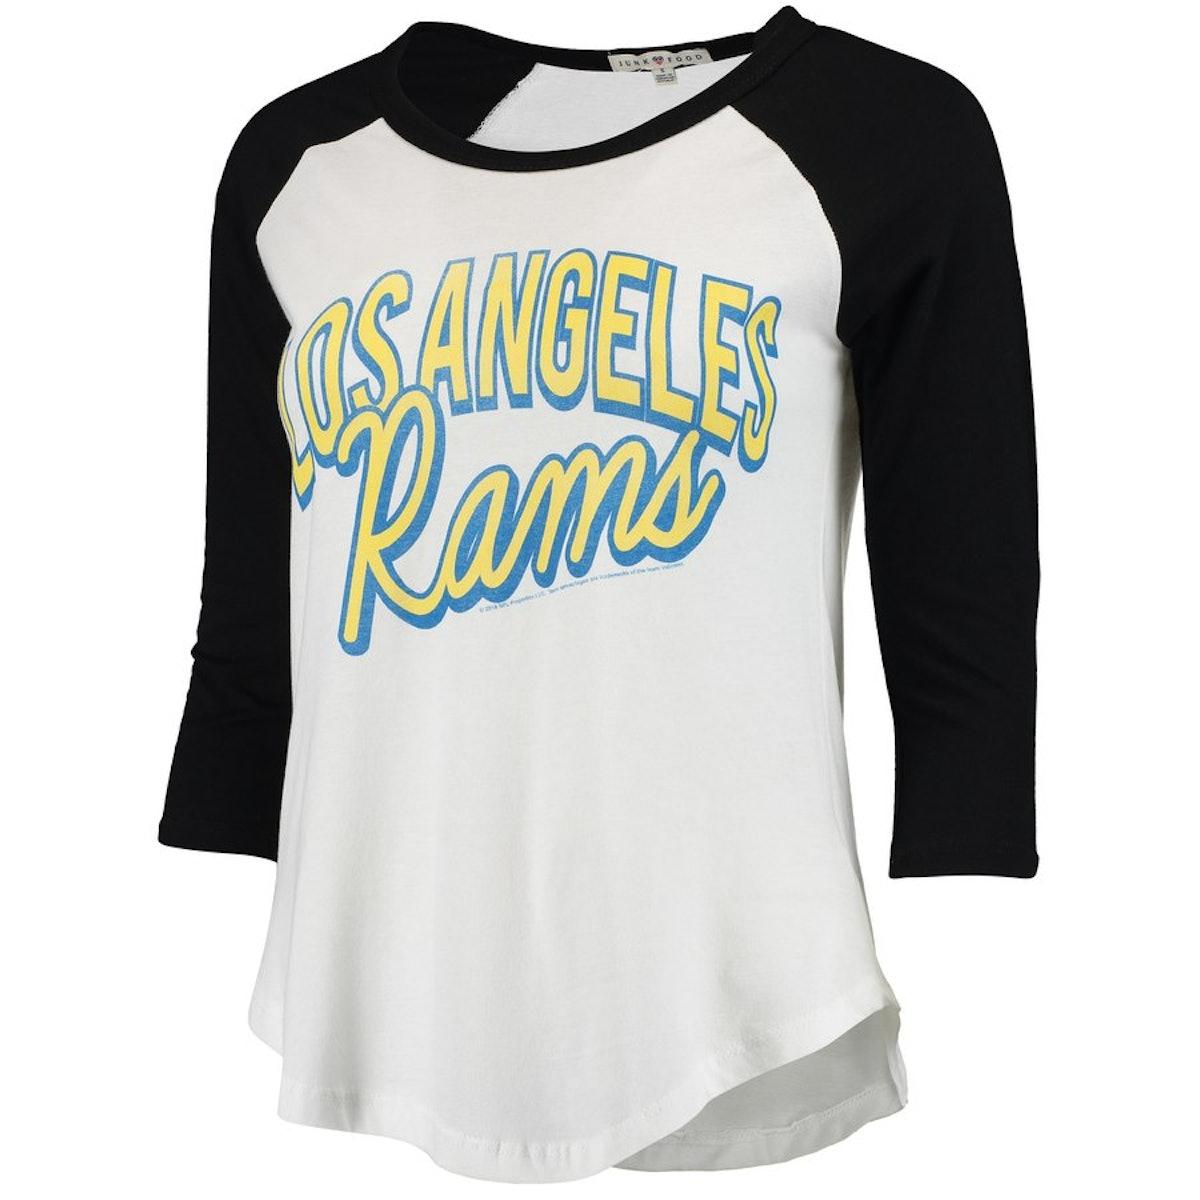 Women's White/Black Los Angeles Rams Play Action Vintage 3/4-Sleeve Raglan T-Shirt